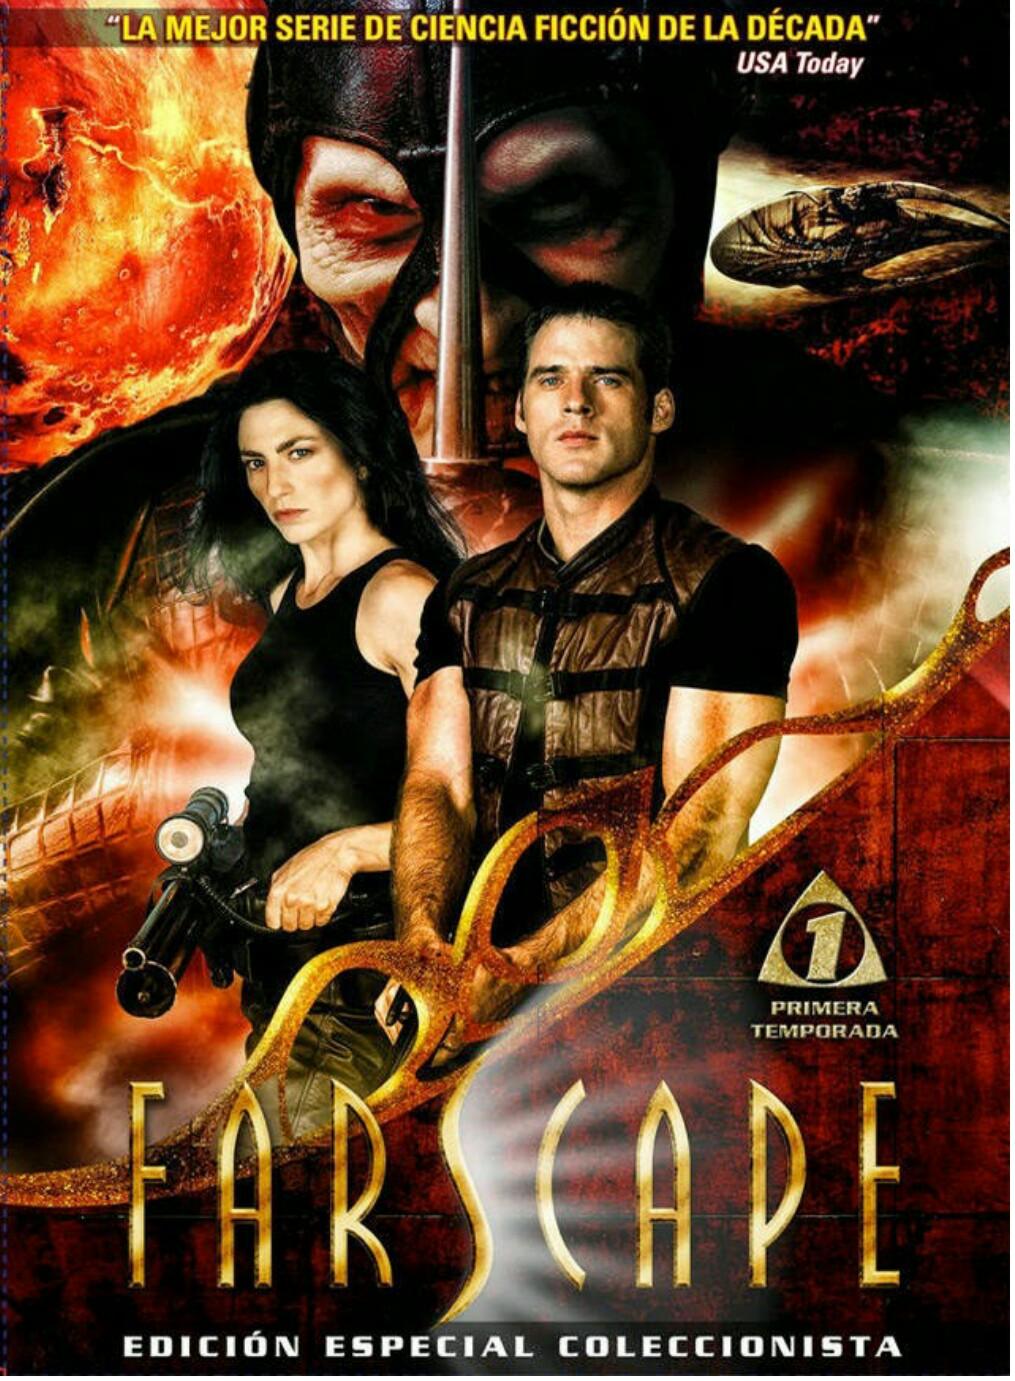 Farscape Temporada 1 WEB DL – 720p Dual Latino/Ingles